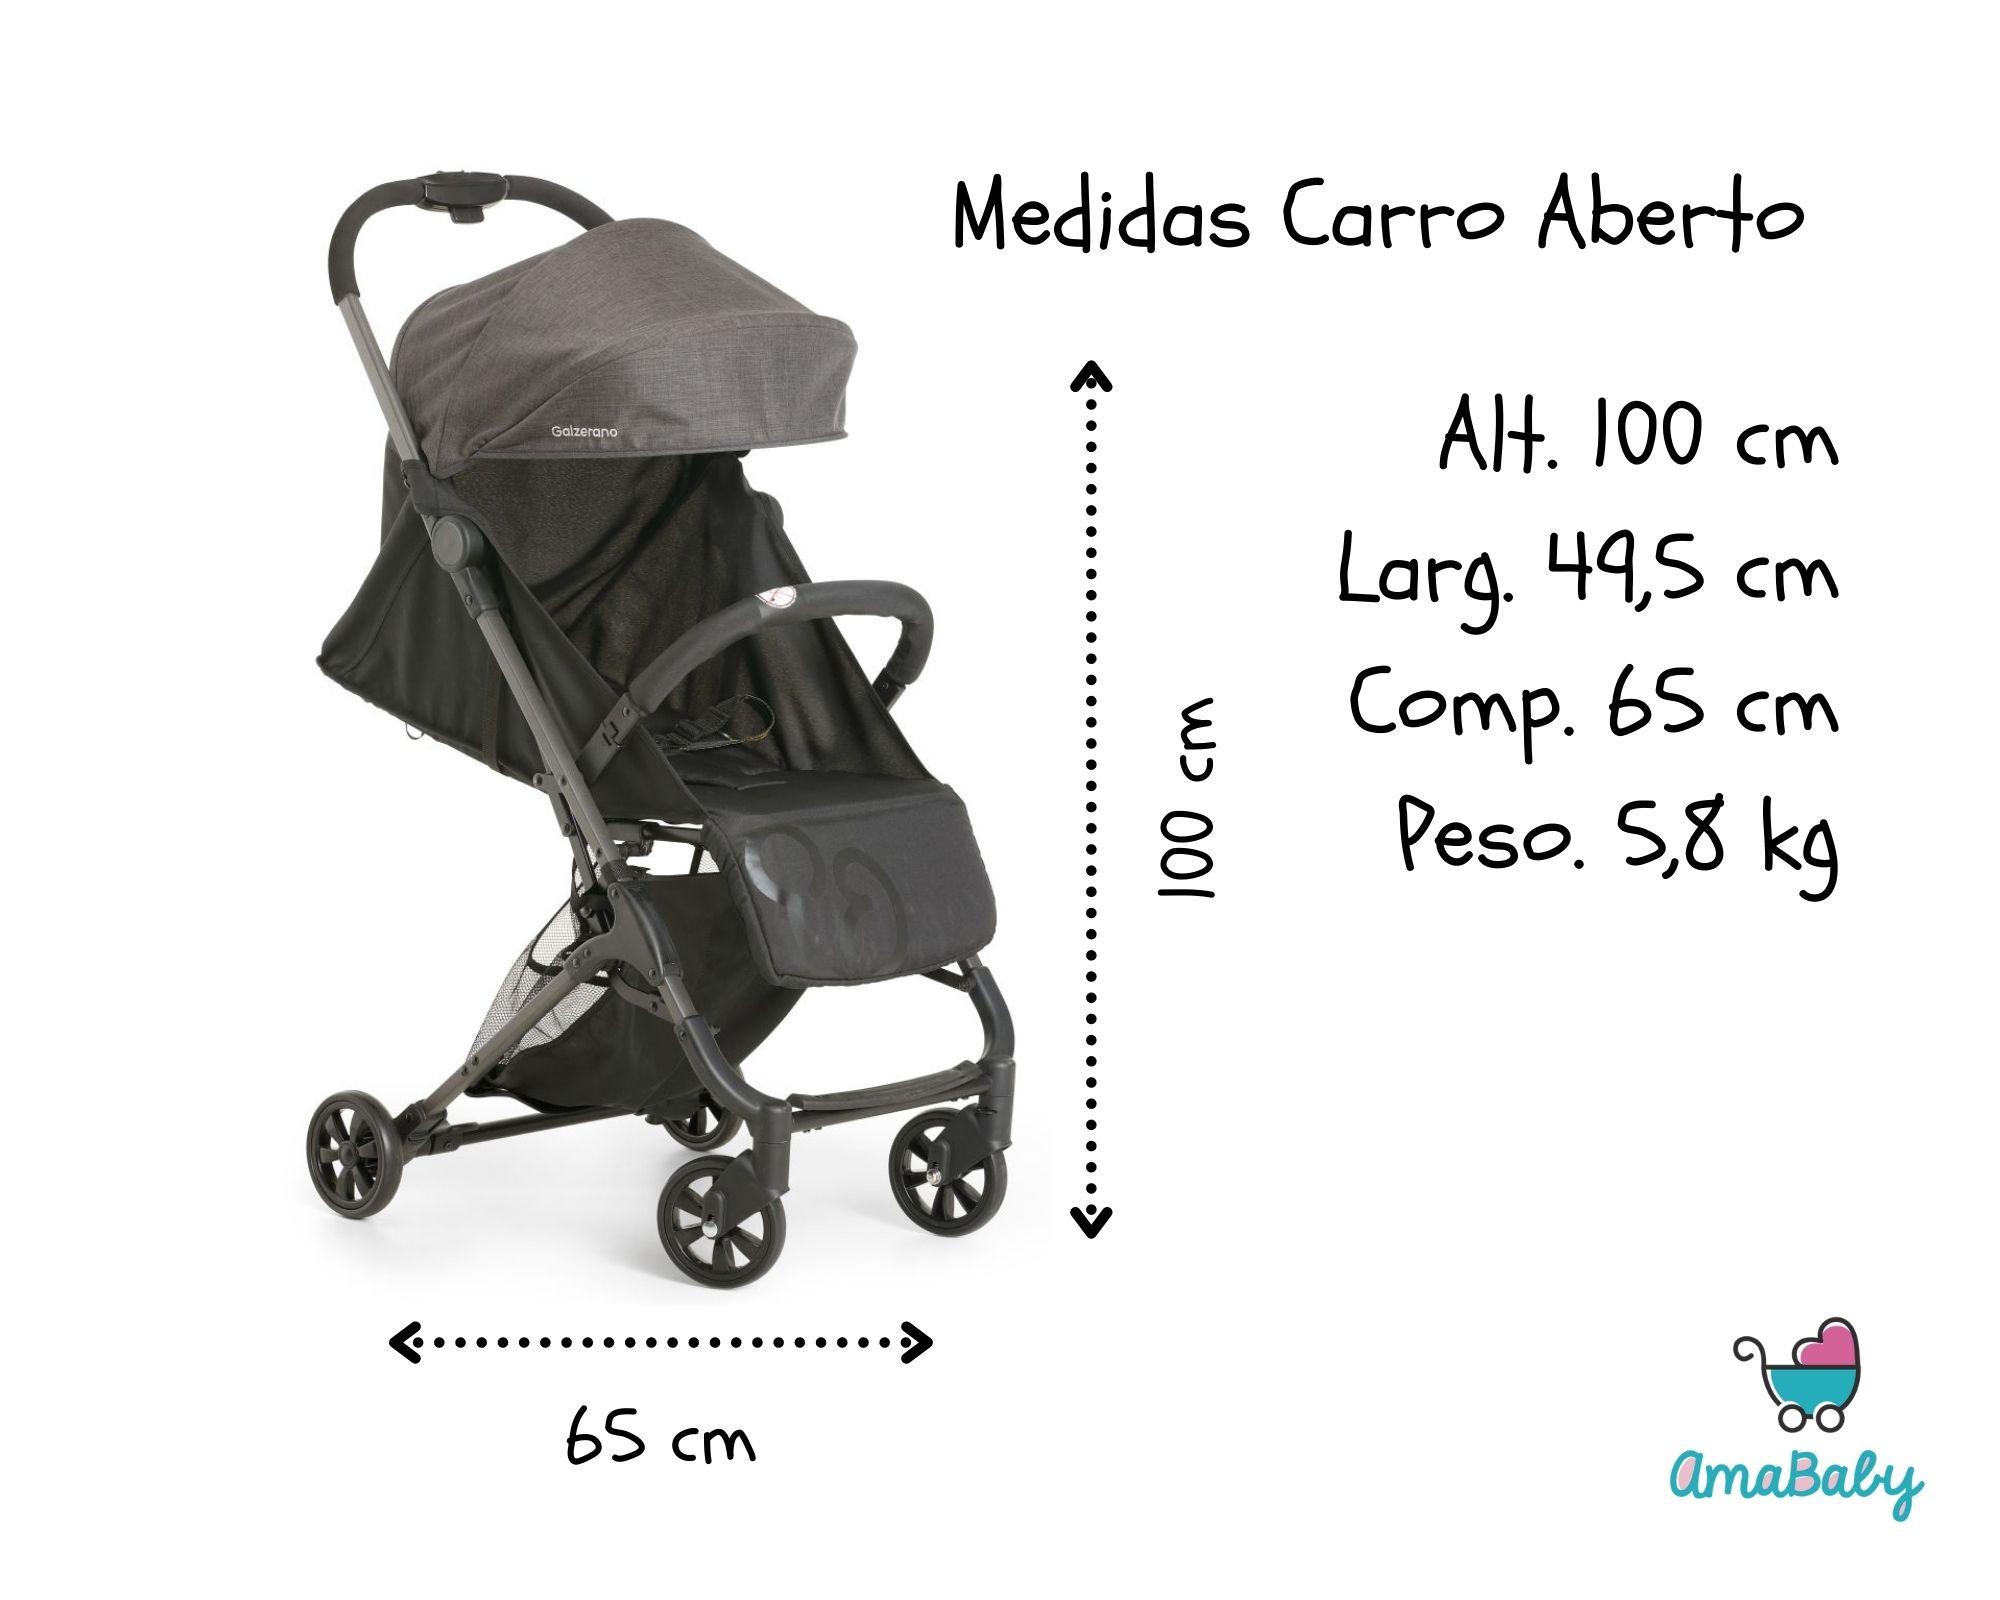 Travel System Carrinho Bebe Duolee + Bebe Conforto + Base Galzerano